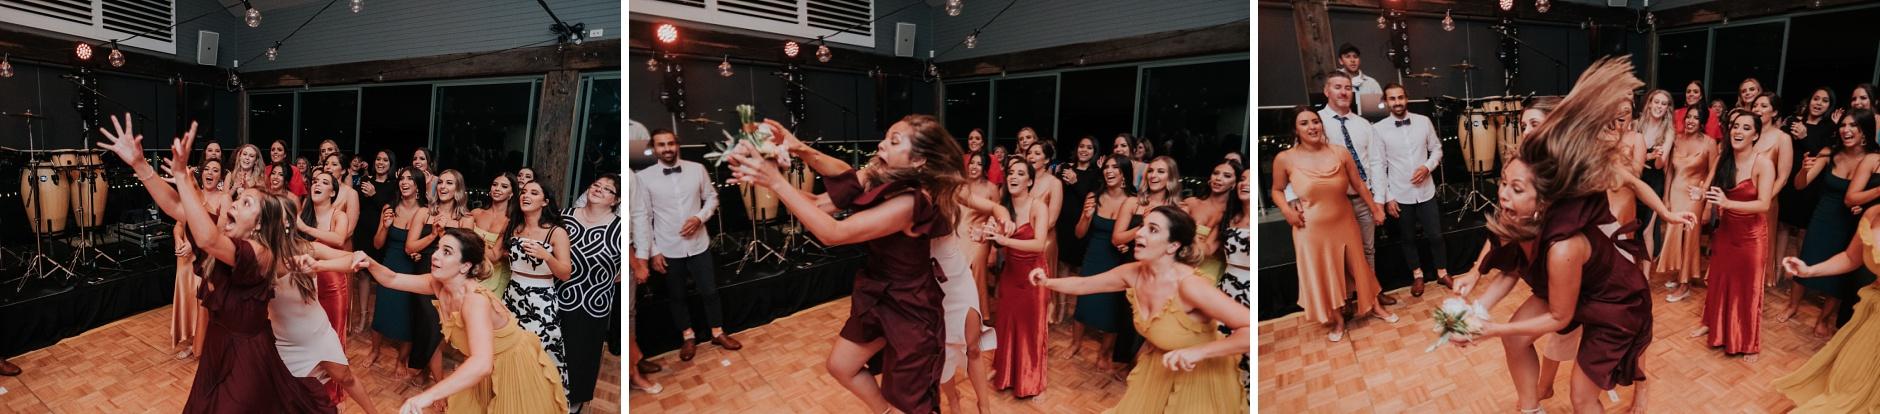 Sydney-Wedding-Photographer_0191.jpg